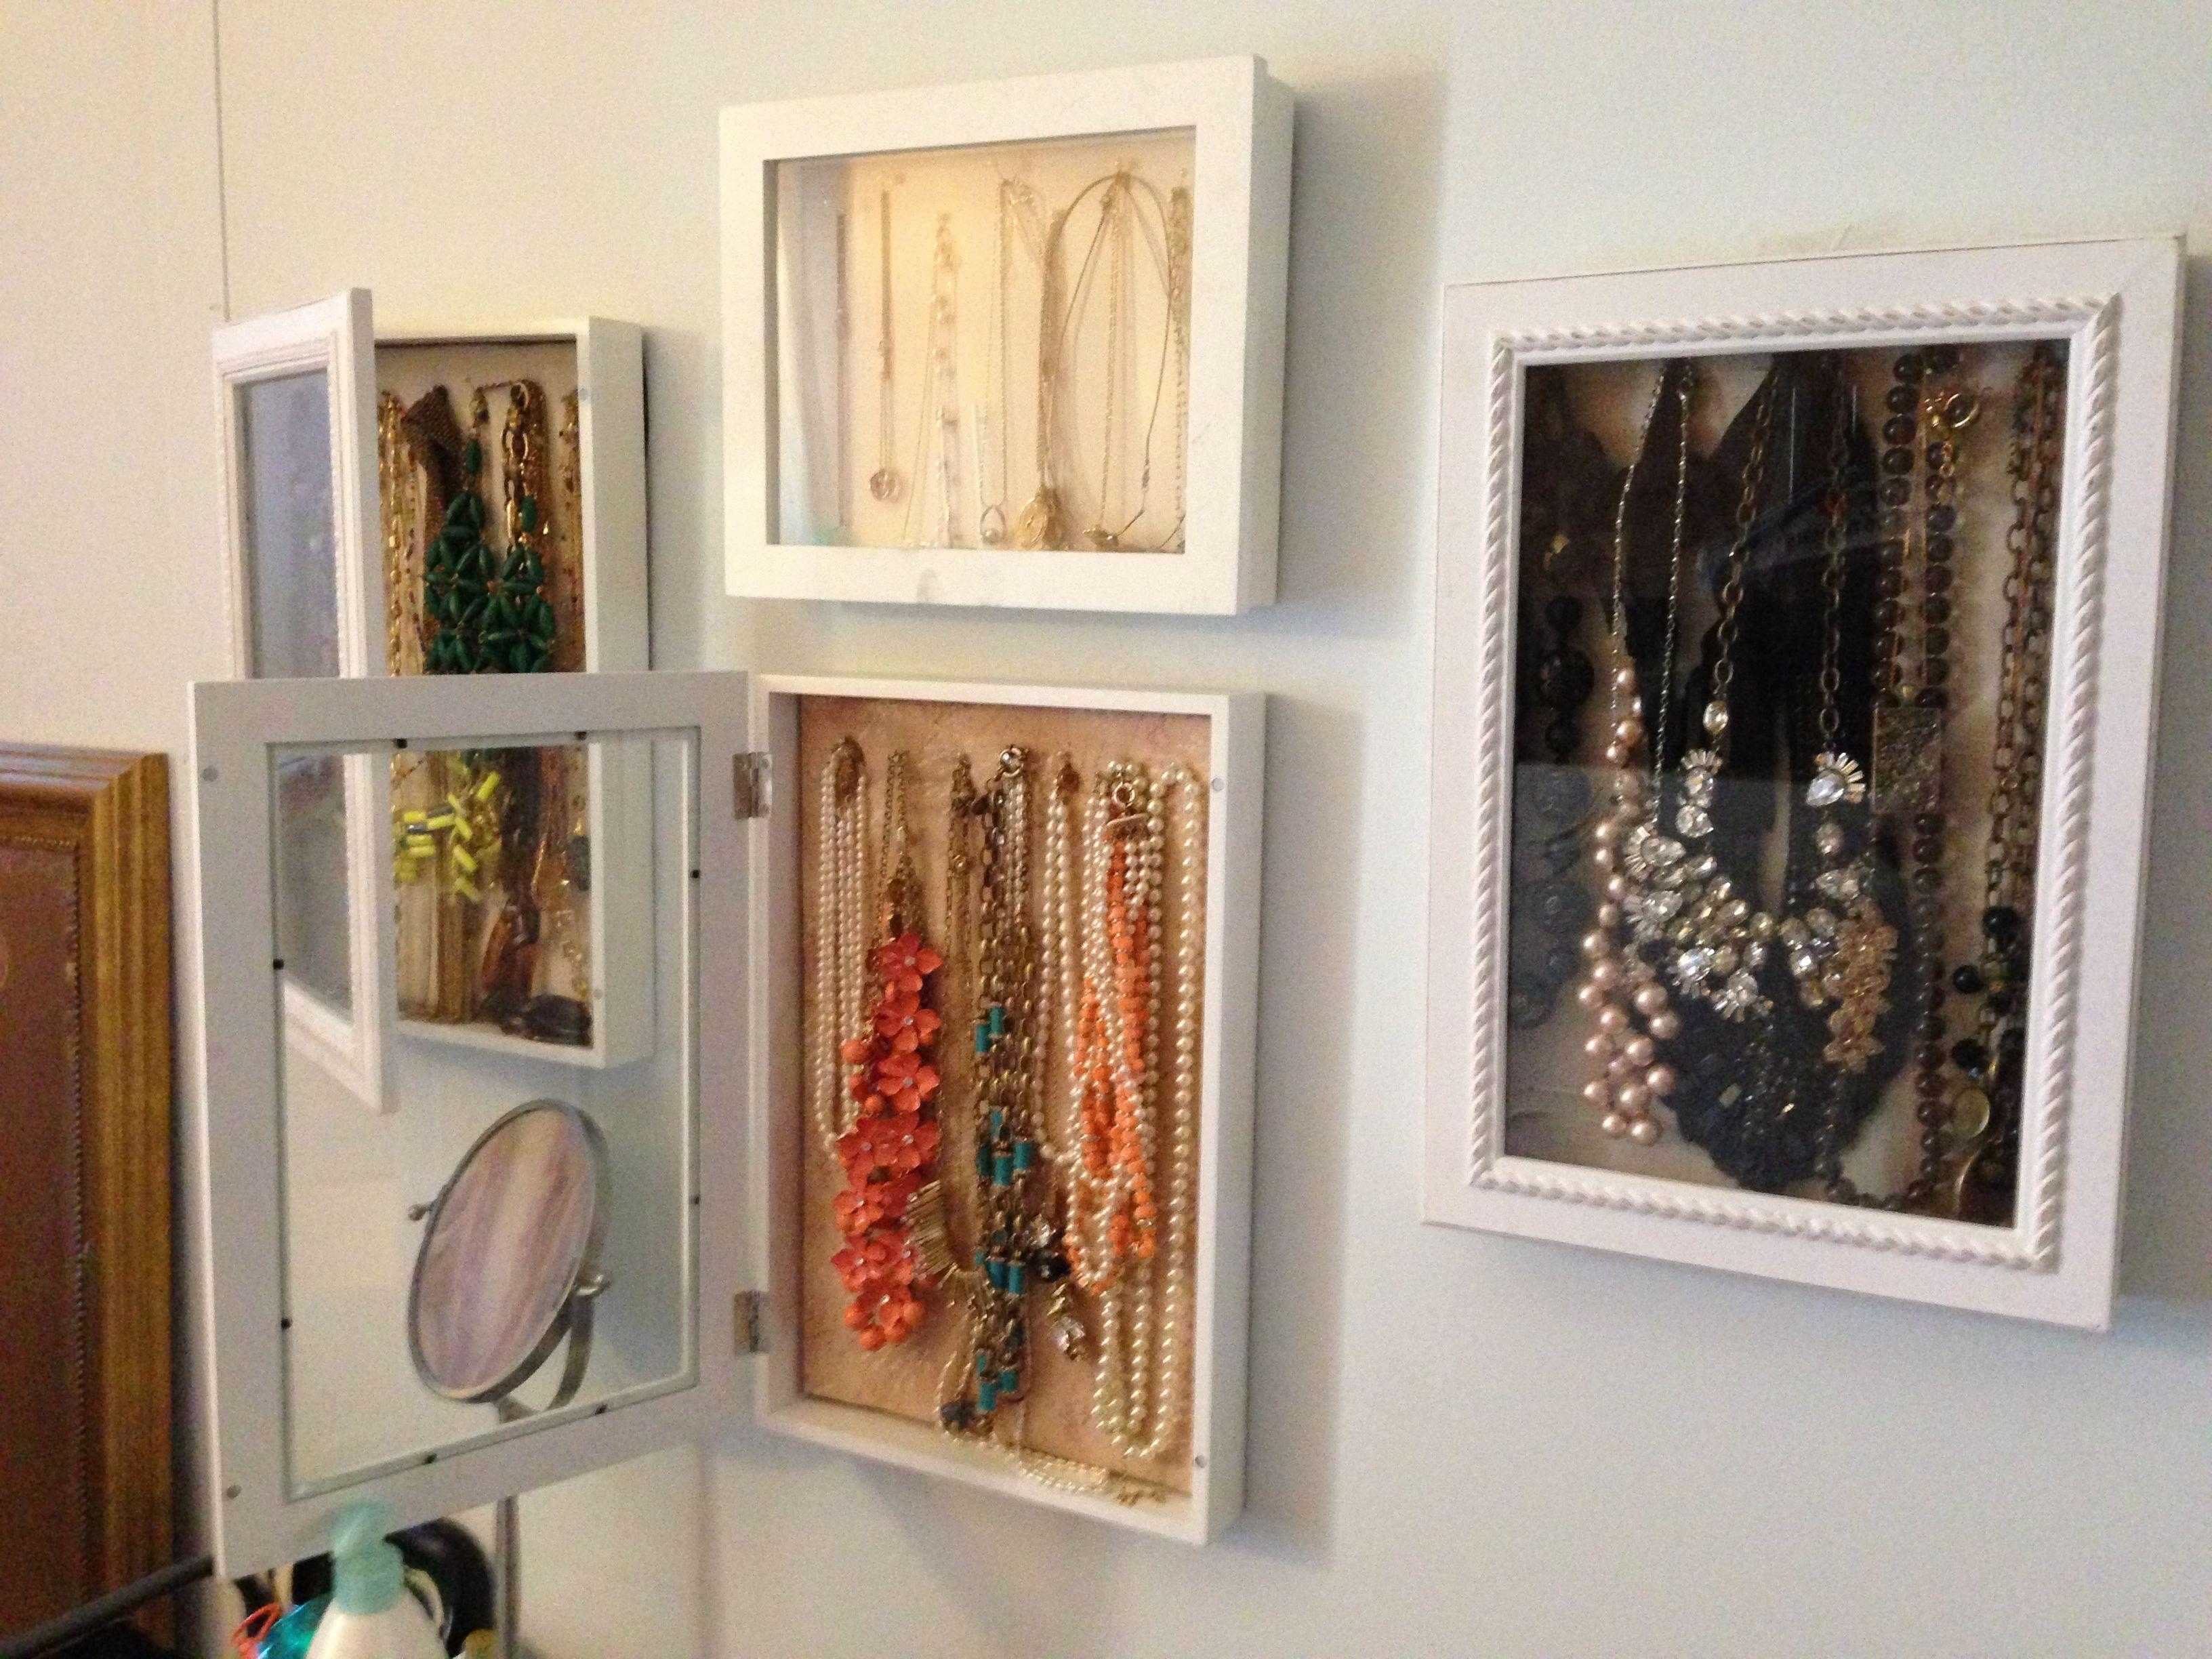 Diy Jewelry Storage Displays Hinged Shadow Box Frames Found At Tj